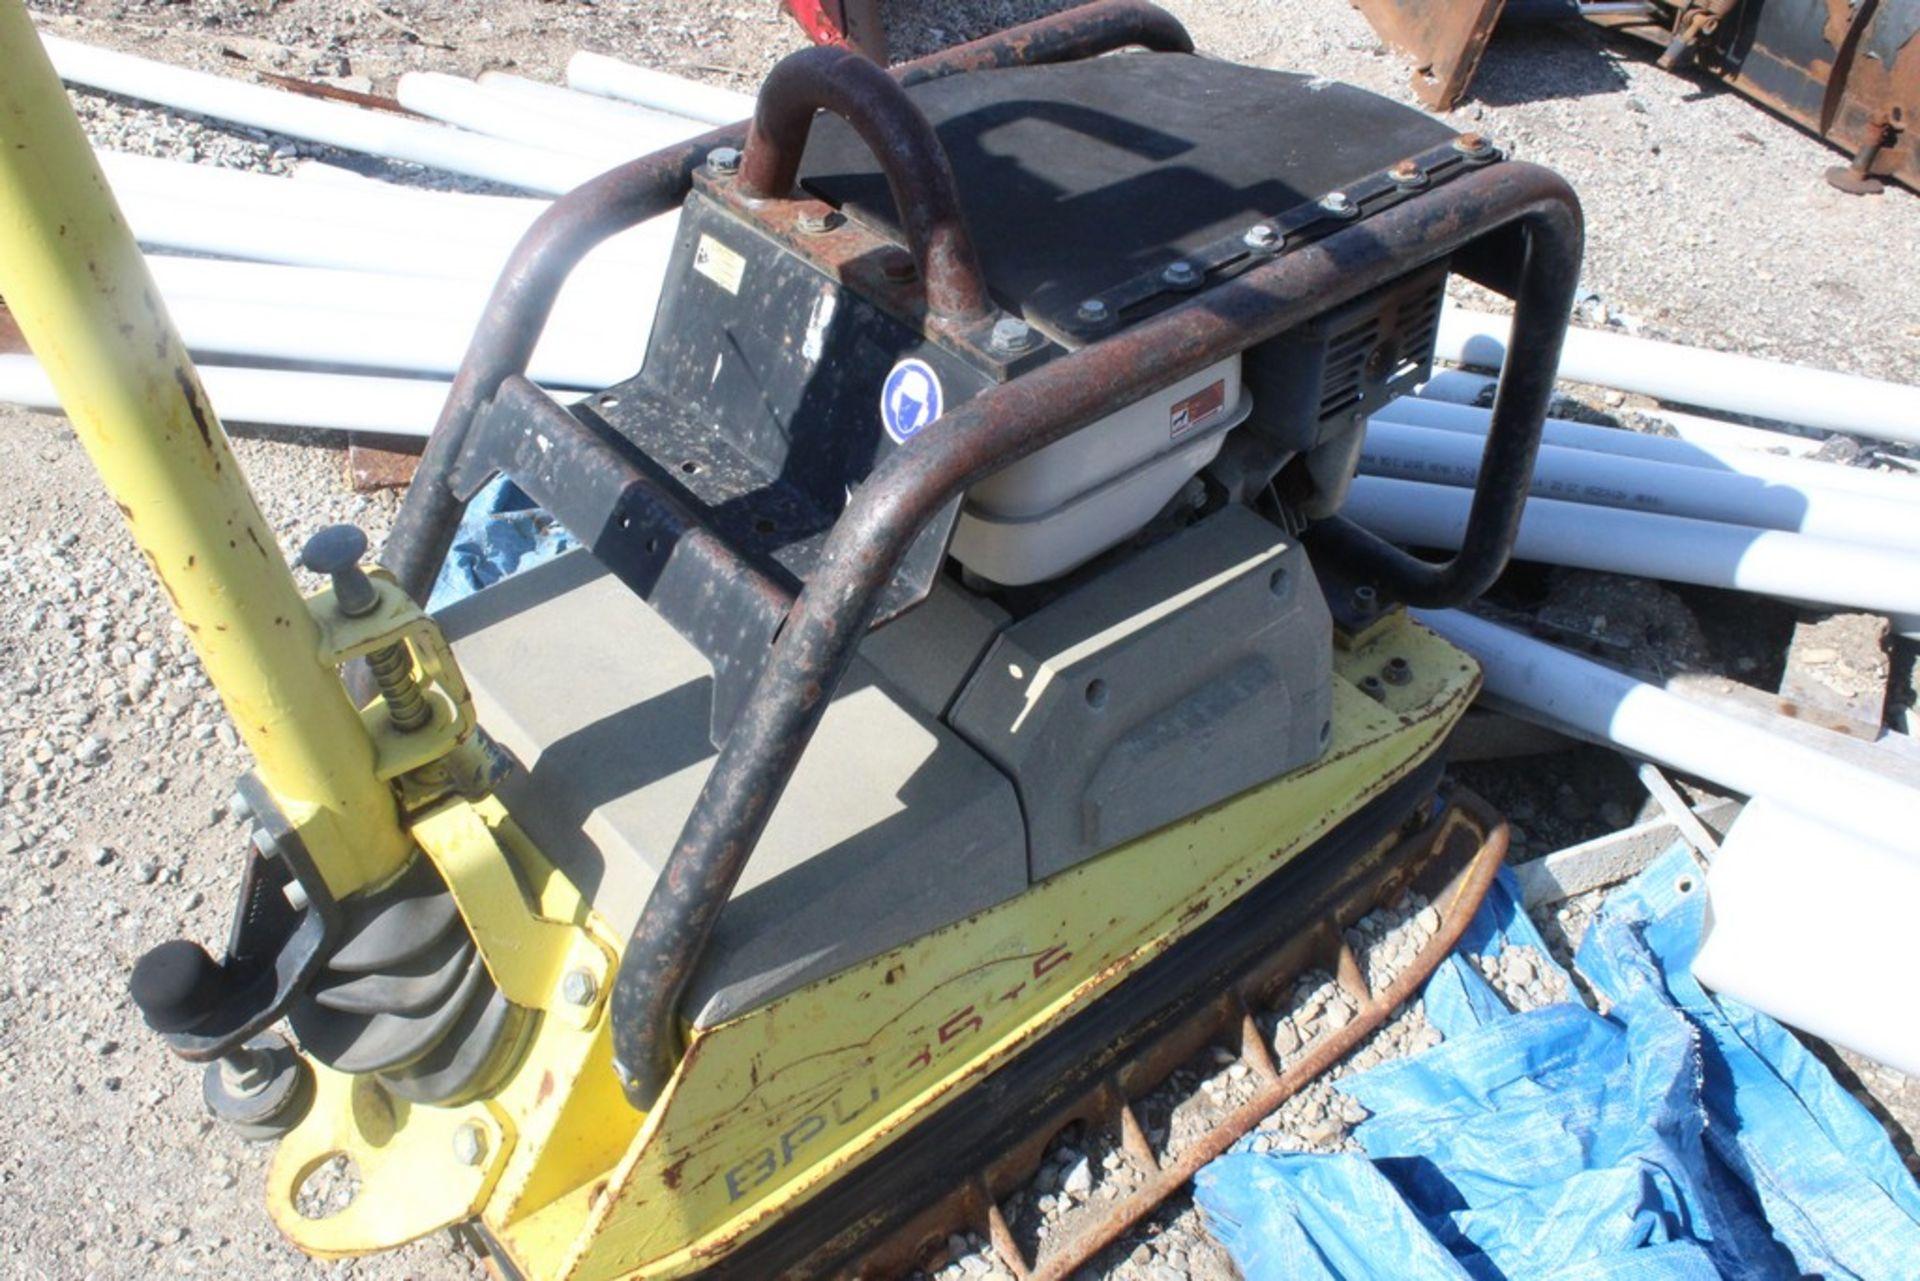 2005 WACKER MODEL BPU3545A REVERSIBLE VIBRATORY PLATE COMPACTOR S/N: 1565711 (2007), HONDA GX270 ( - Image 2 of 3